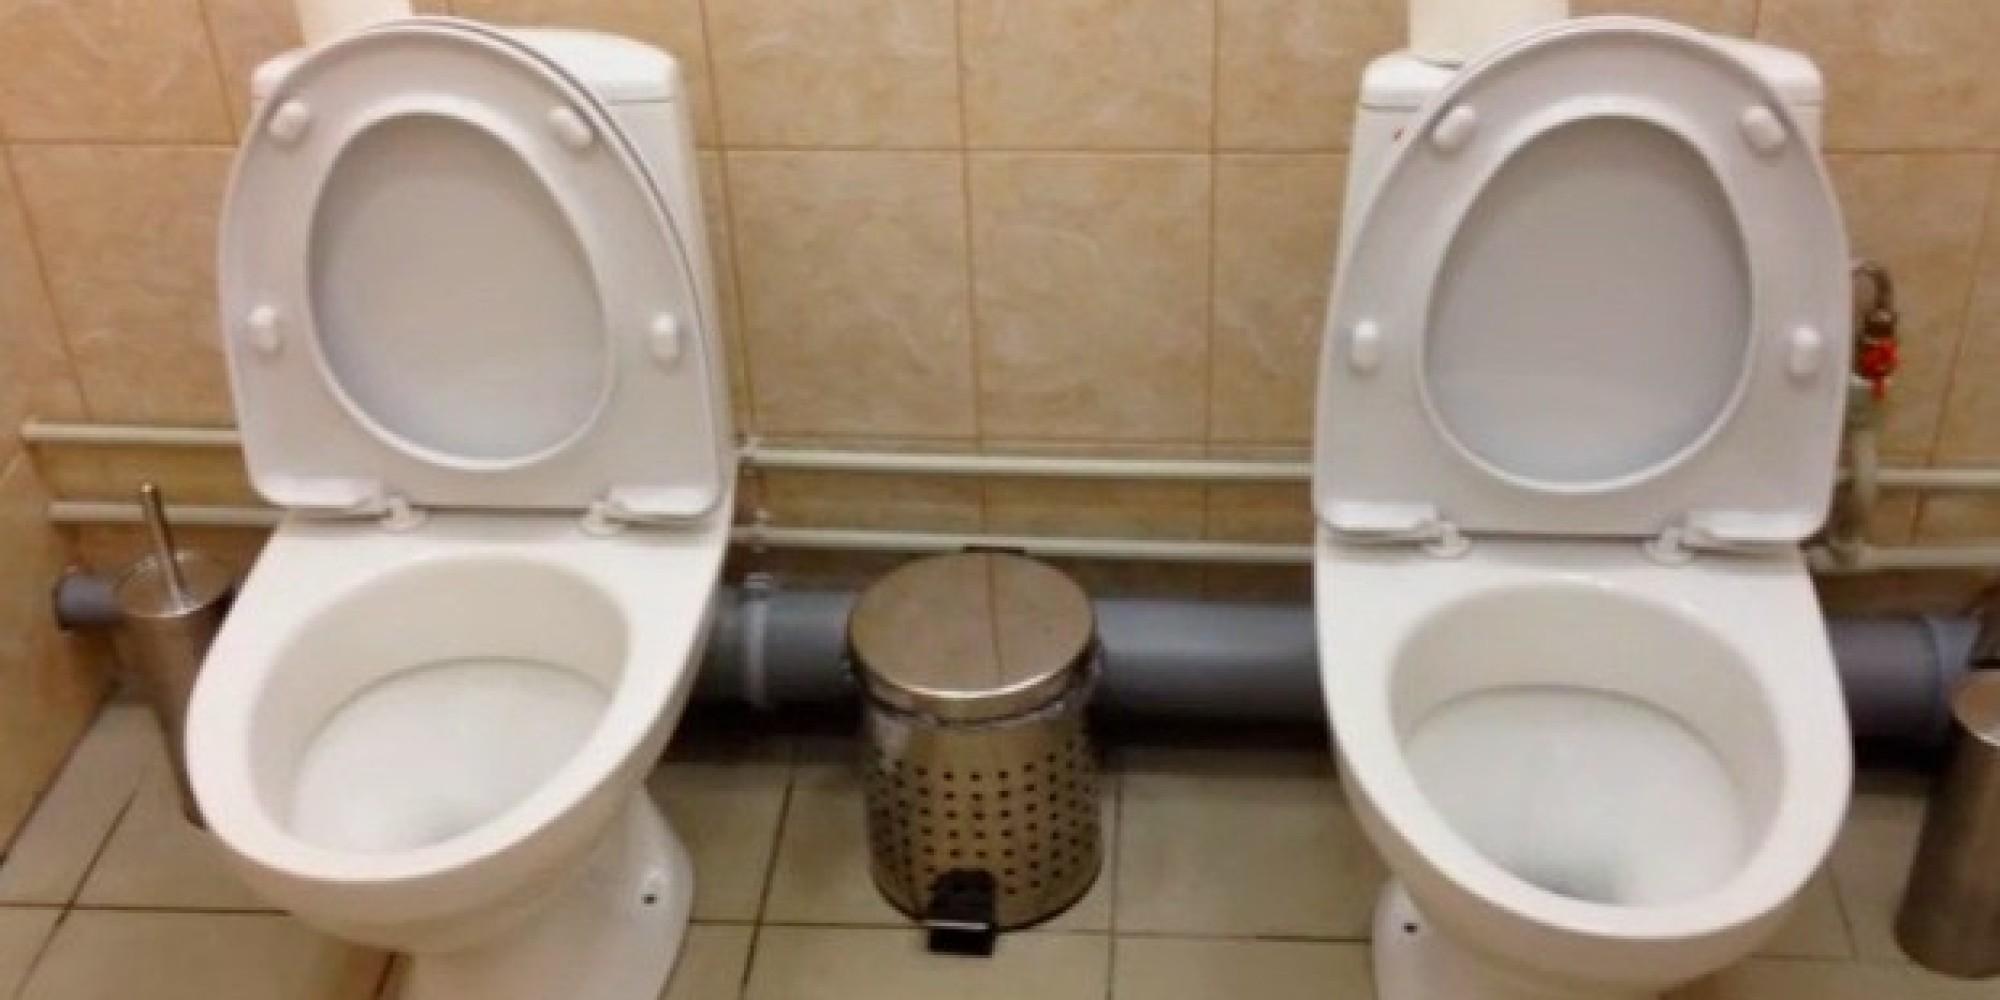 sotschi russland baut doppel toiletten f r olympische. Black Bedroom Furniture Sets. Home Design Ideas